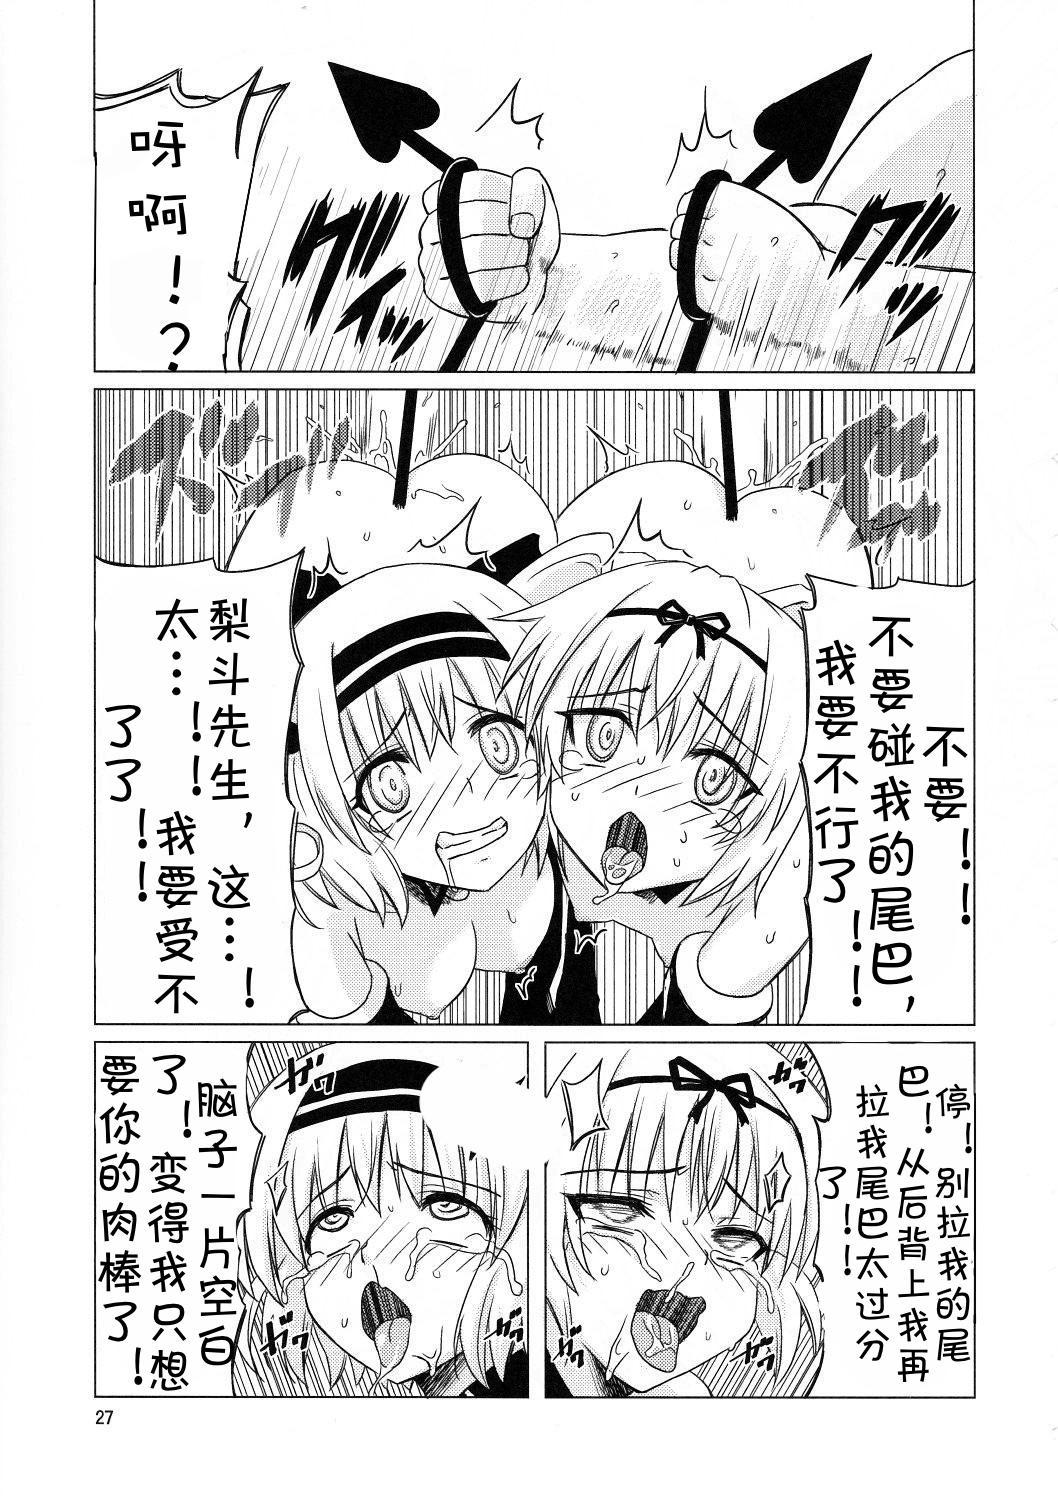 Kanryou Harem Keikaku Imouto Tengoku | Harem Plan Complete - Little Sister Heaven 25